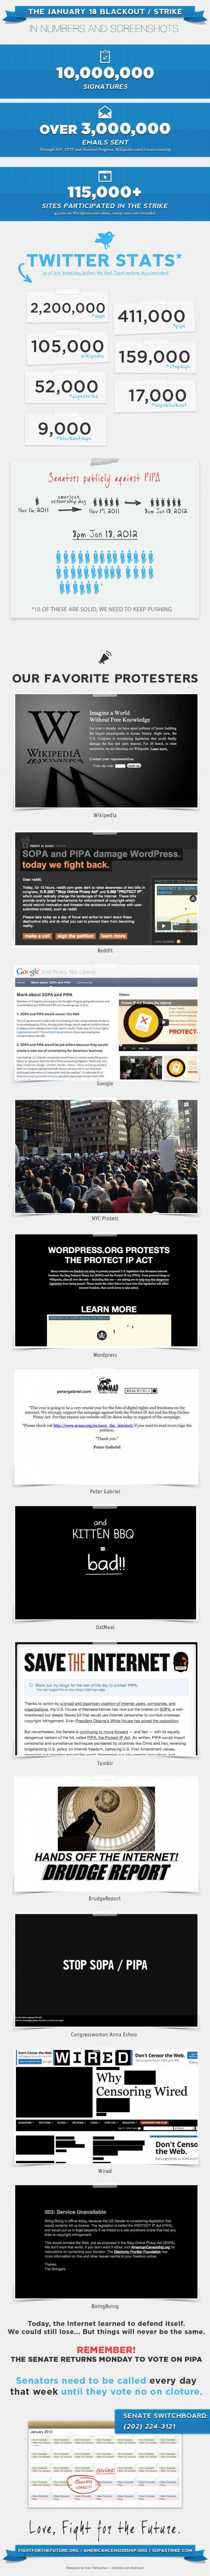 SOPAstrike's anti-SOPA anti-PIPA infographic